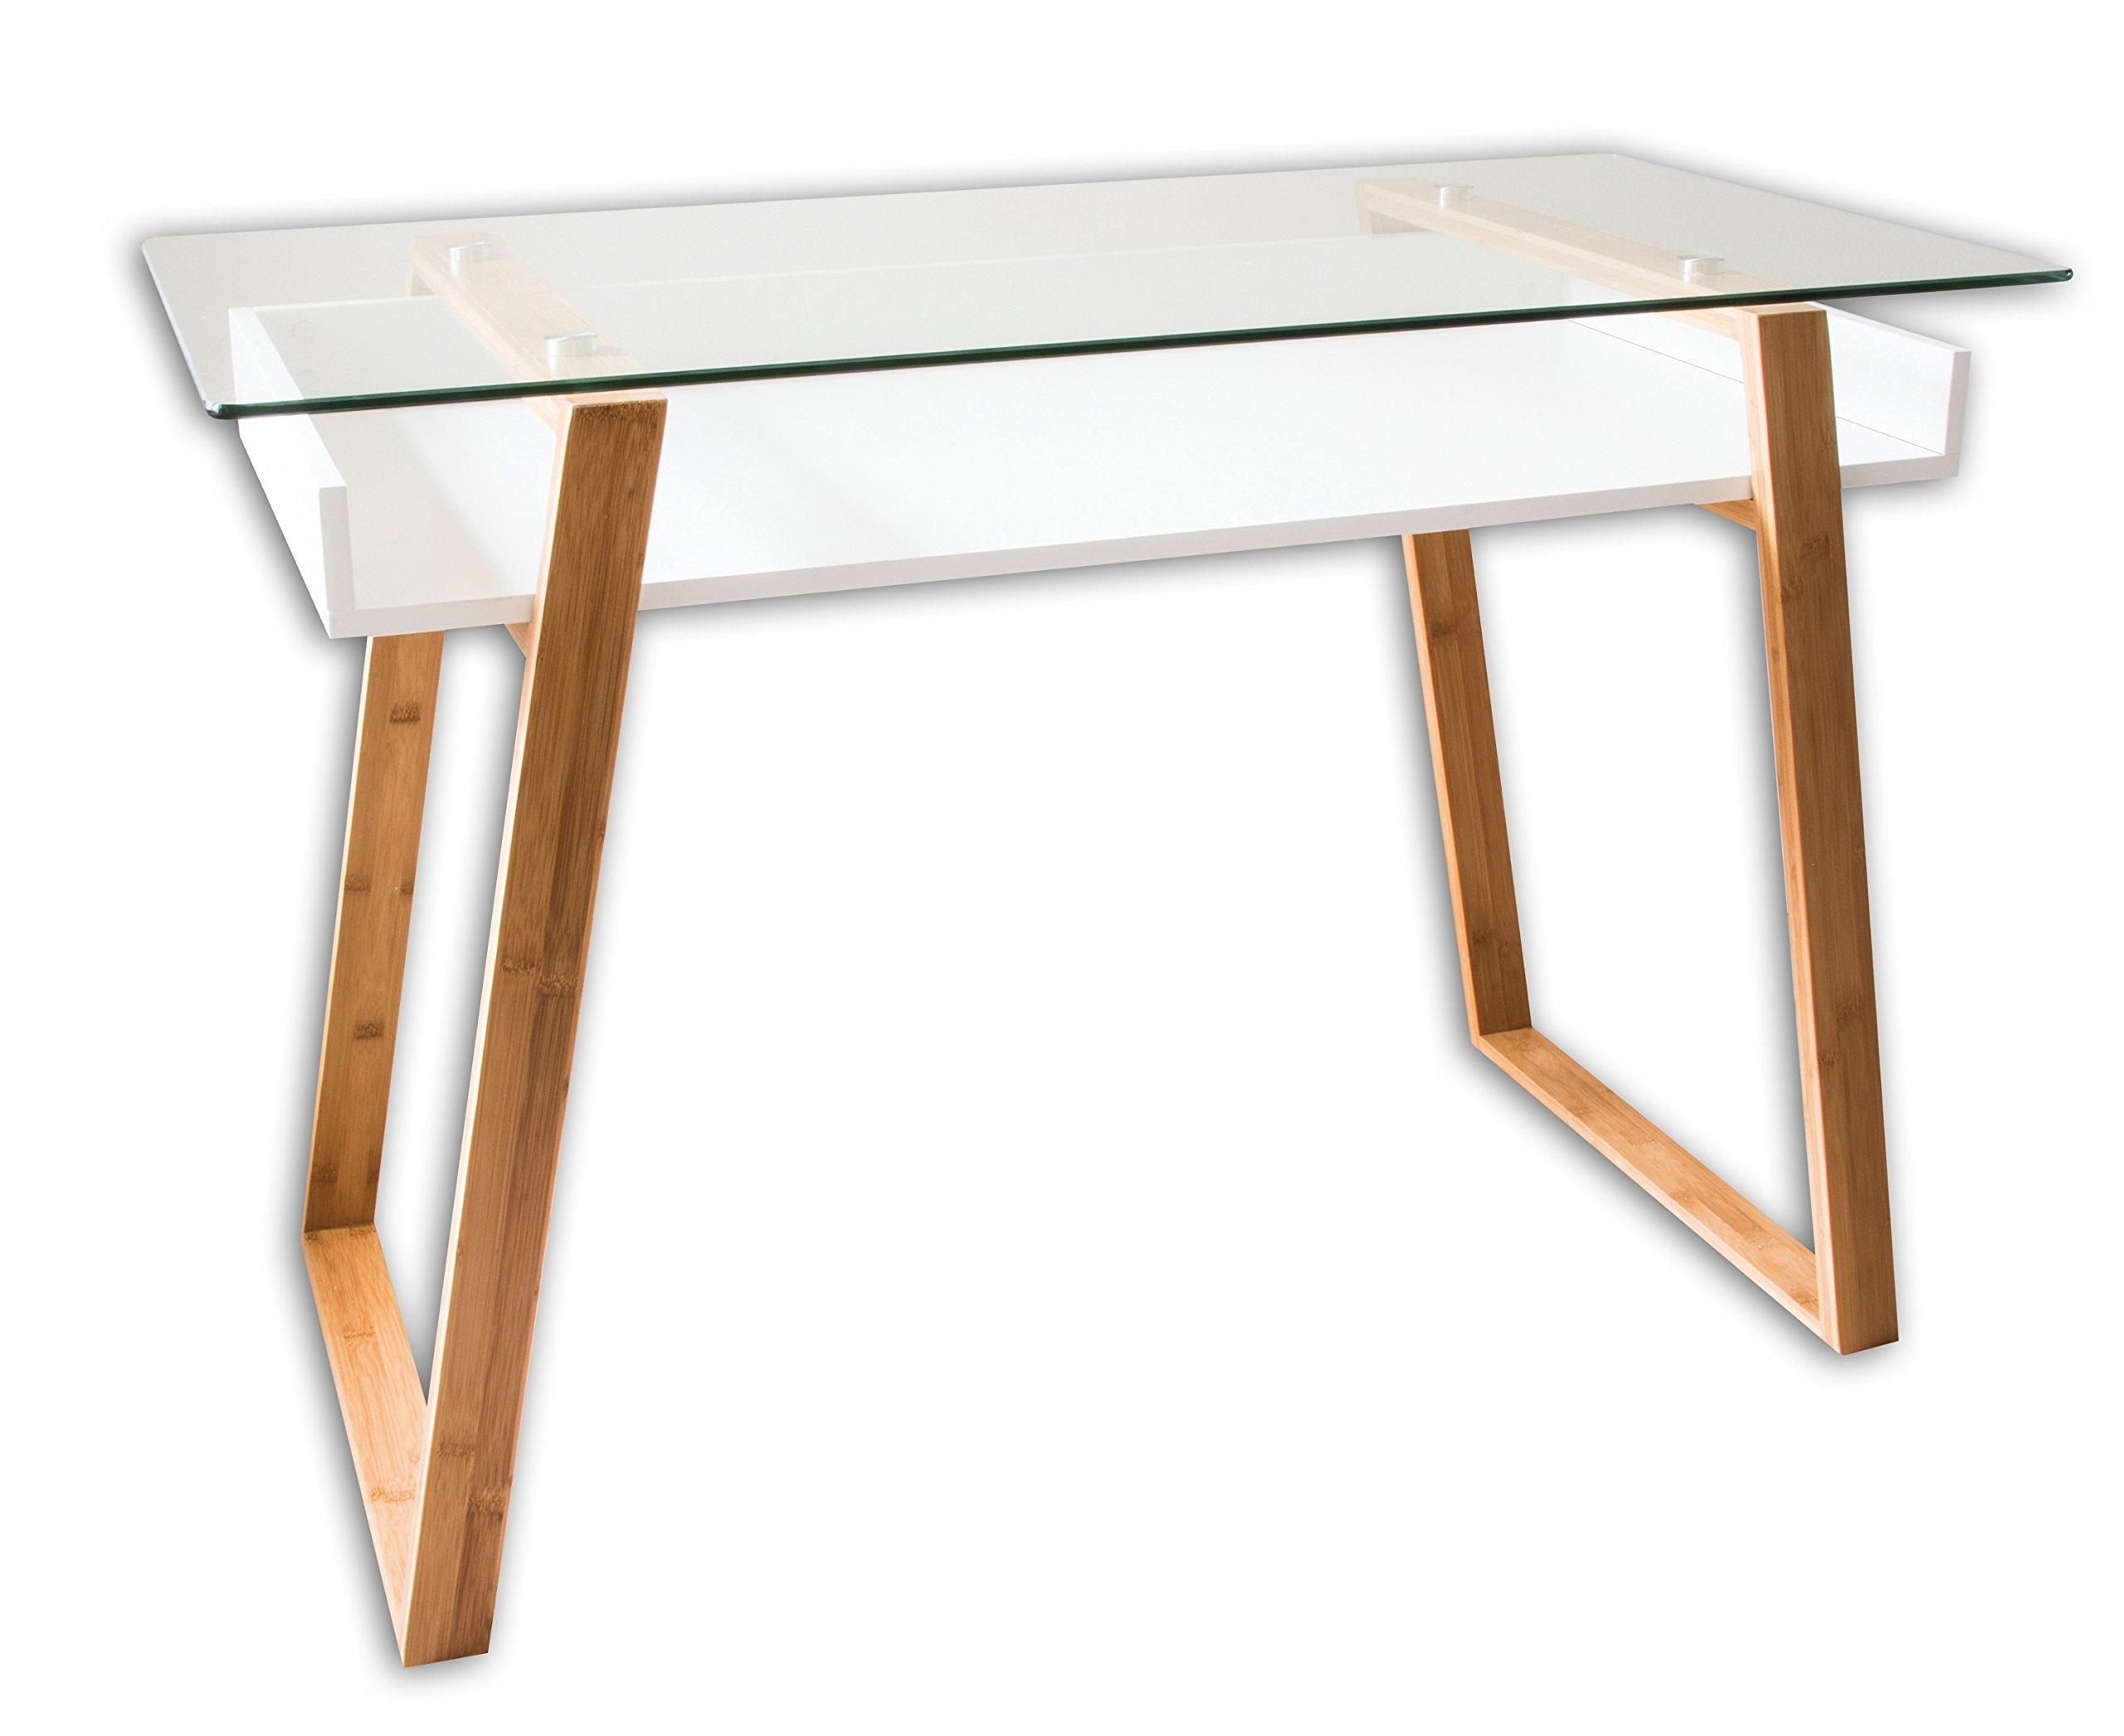 Bonvivo Designer Desk Massimo, Modern Secretary In A Contemporary Design by bonVIVO